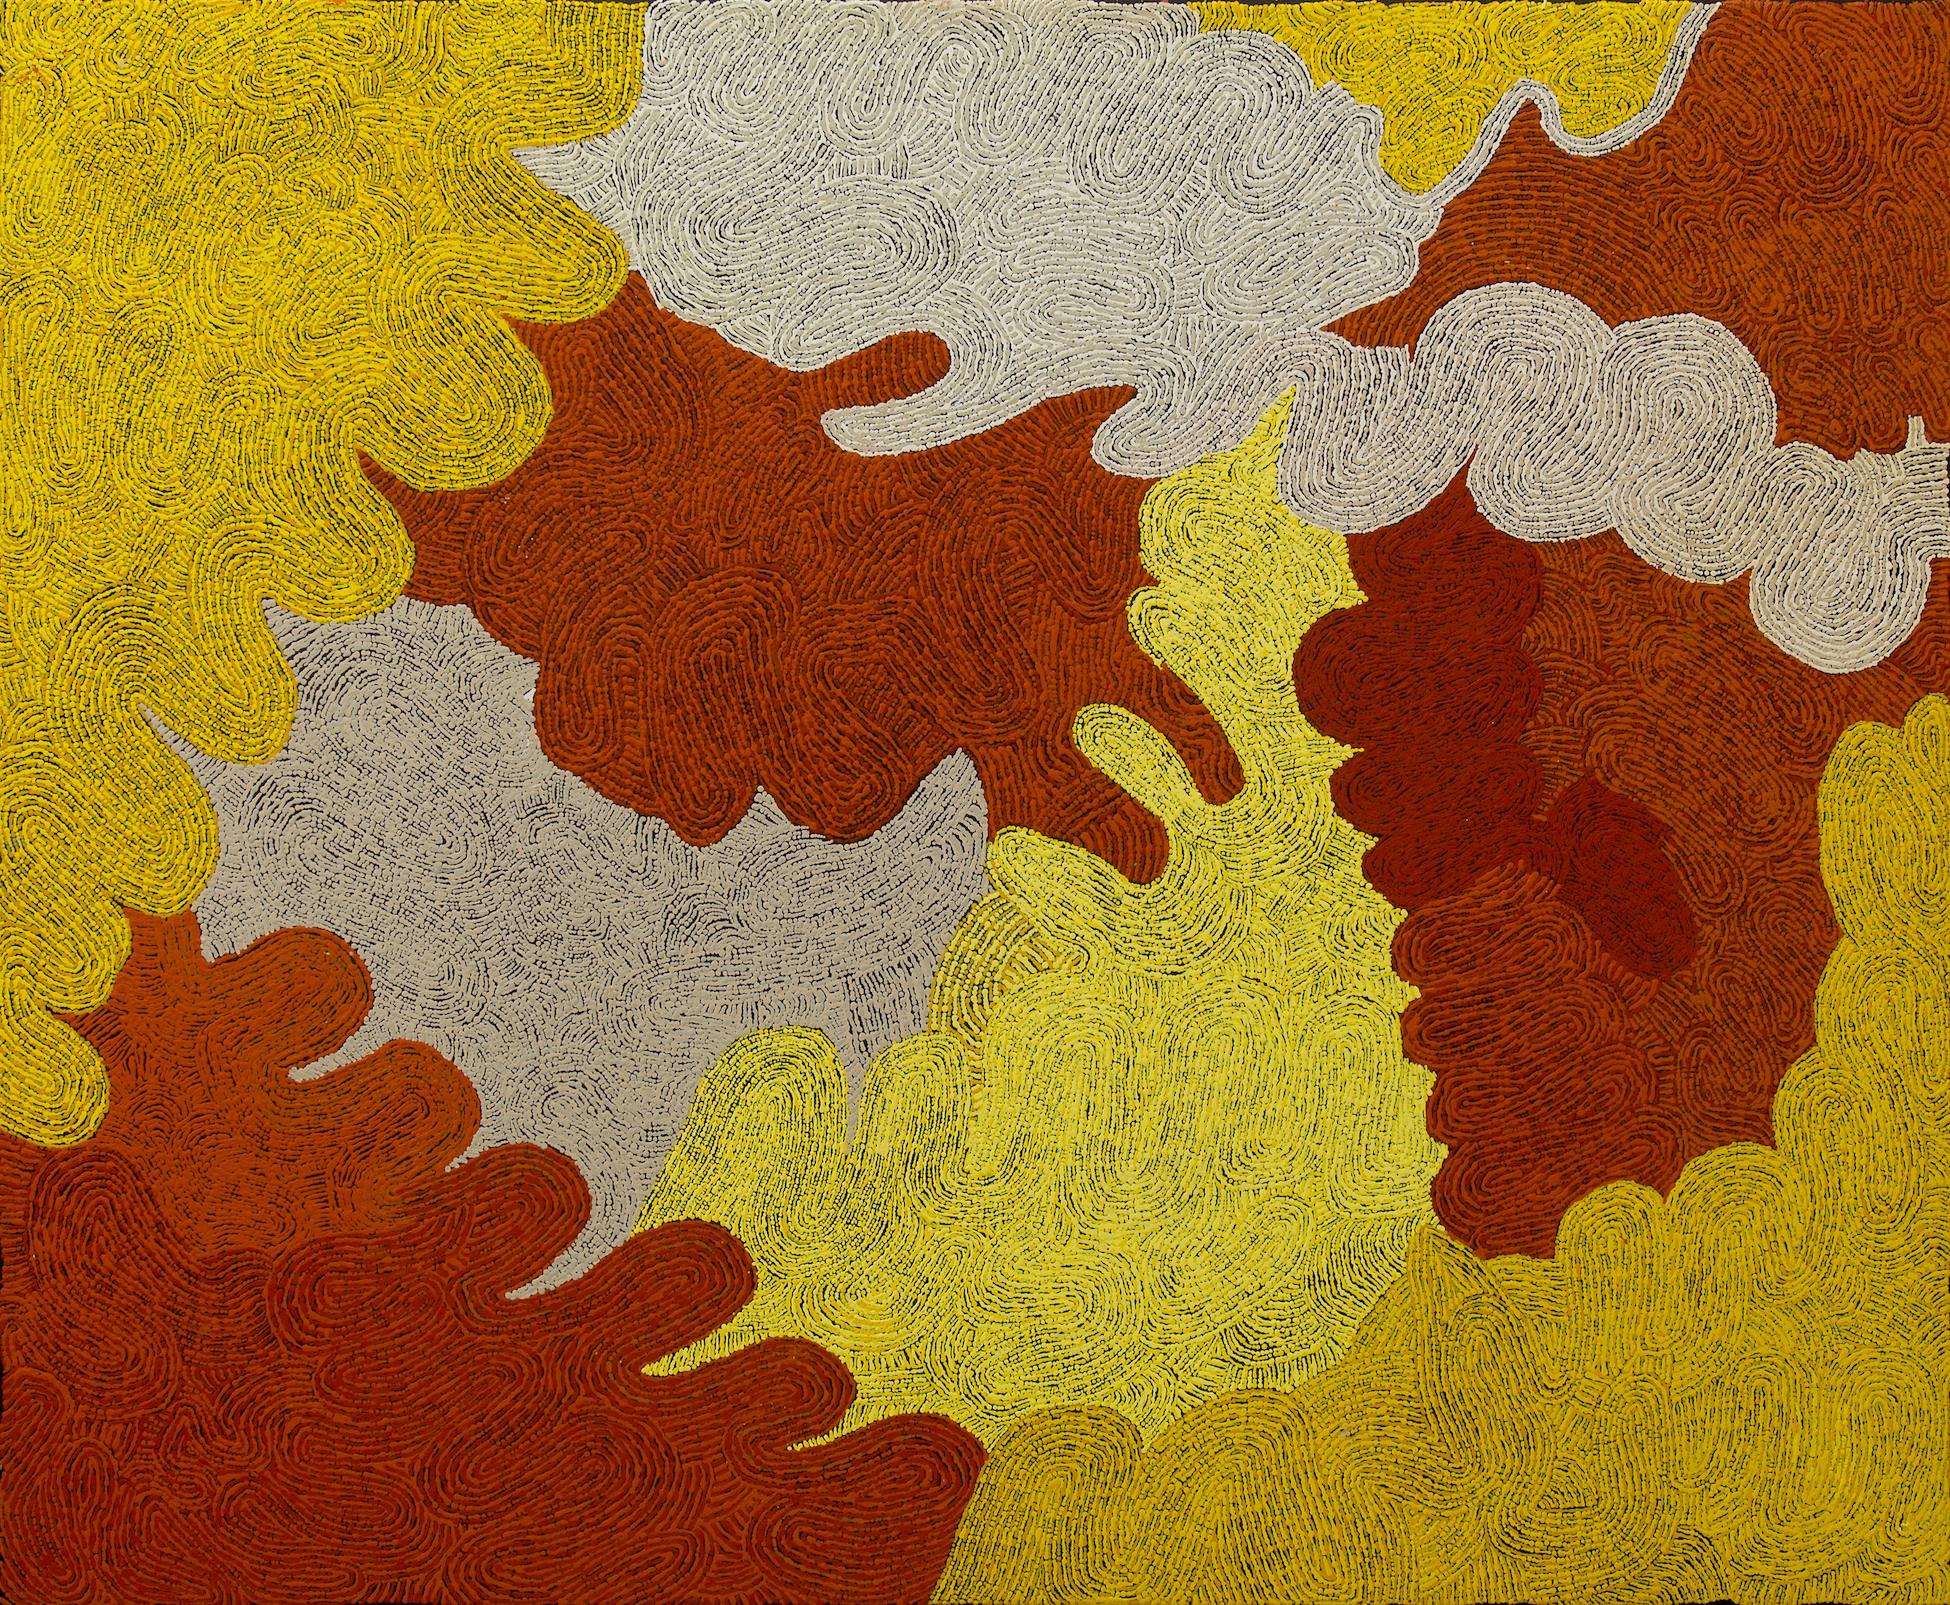 "Carlene Thompson  Kalaya ngura  Acrylic on canvas 39"" x 48"" (100 x 122 cm) Ernabella Arts Catalog #472-14   Price Available upon Request"